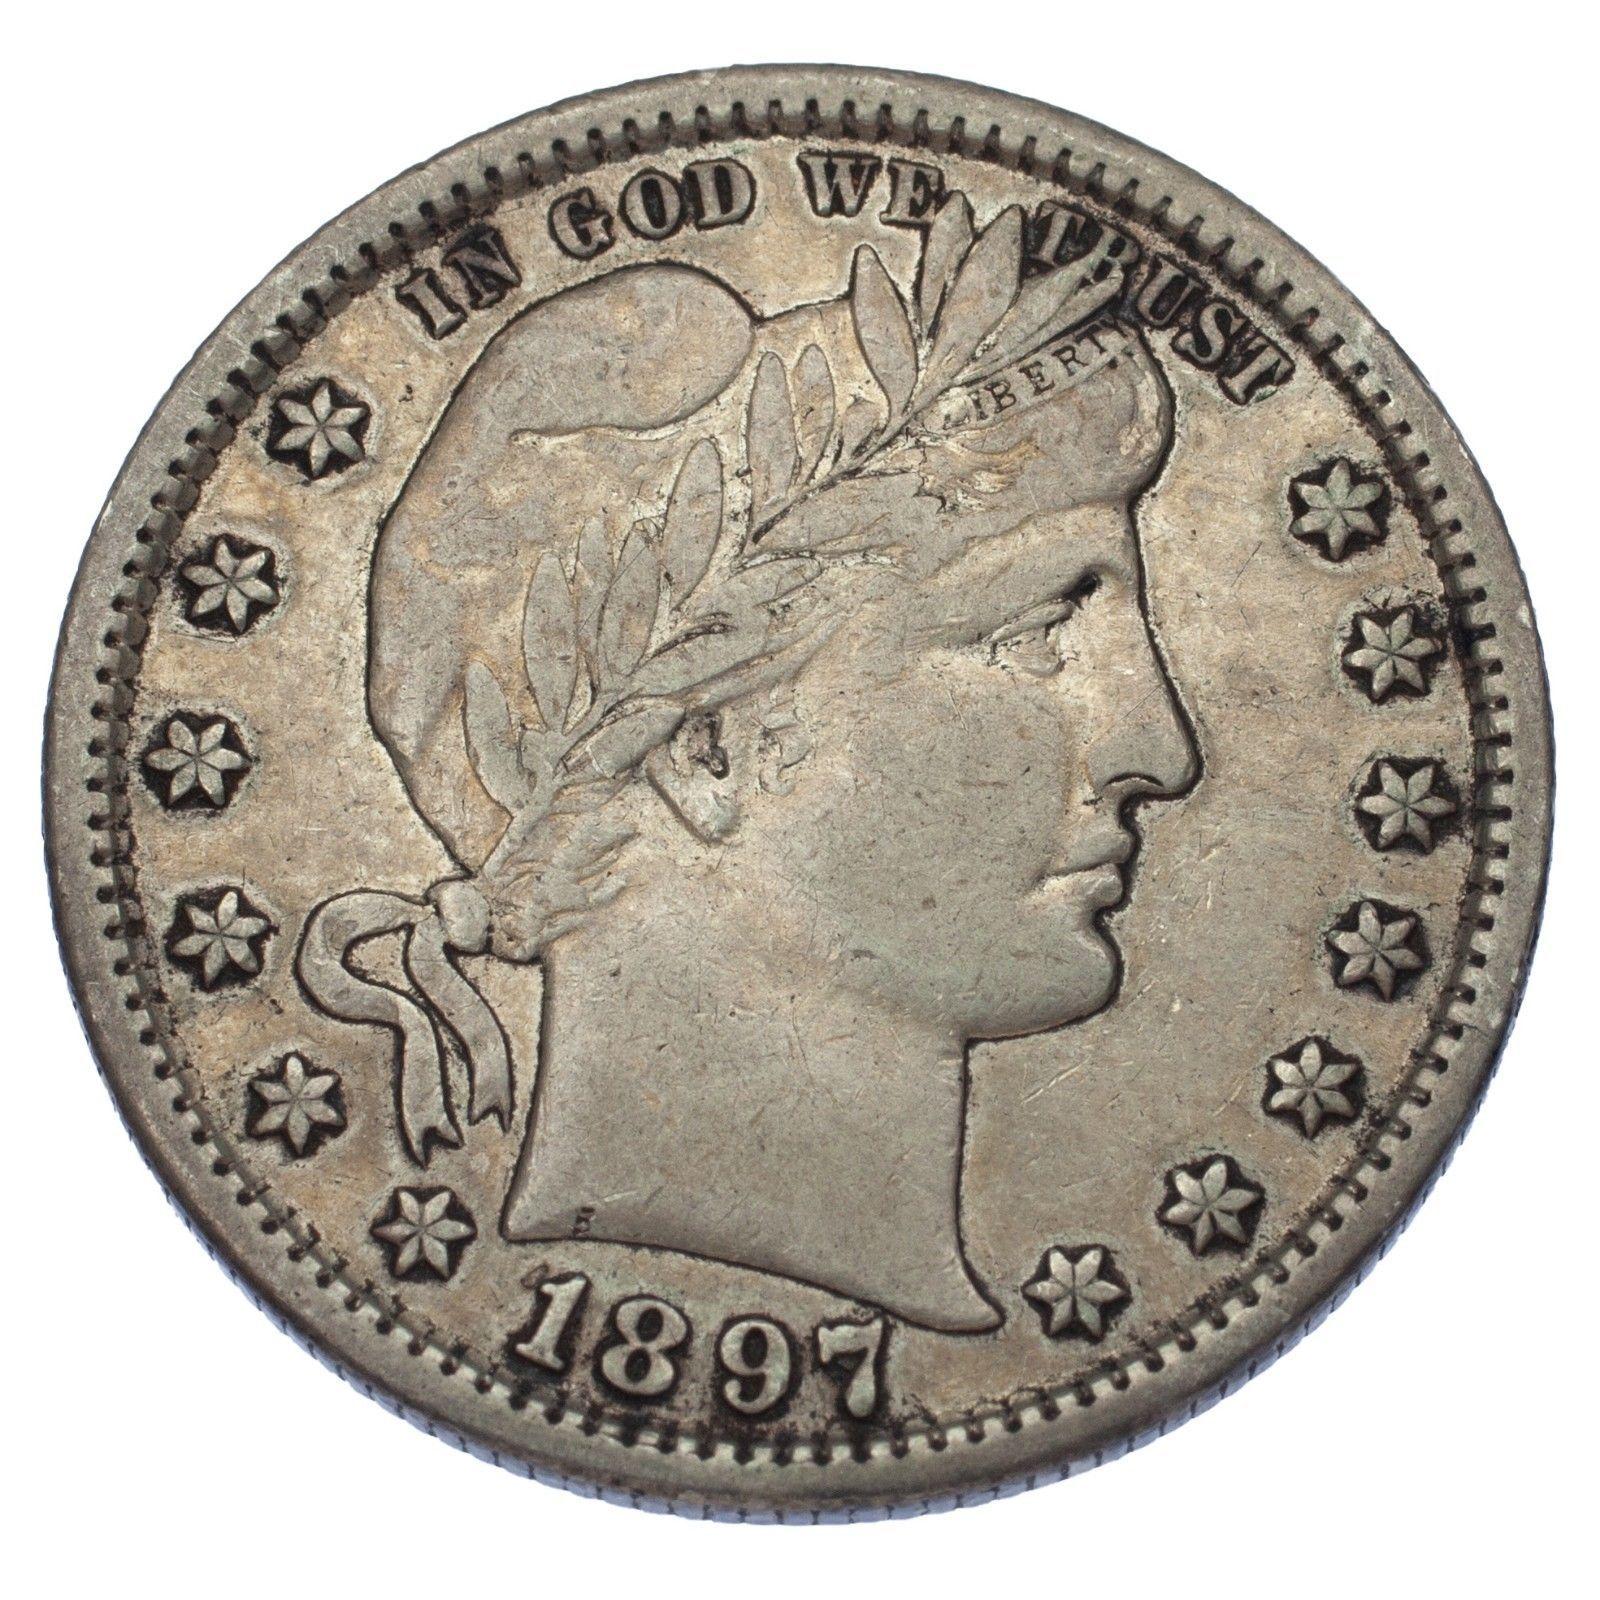 1897-S 25C Barber Quarter (Very Fine, VF Condition)